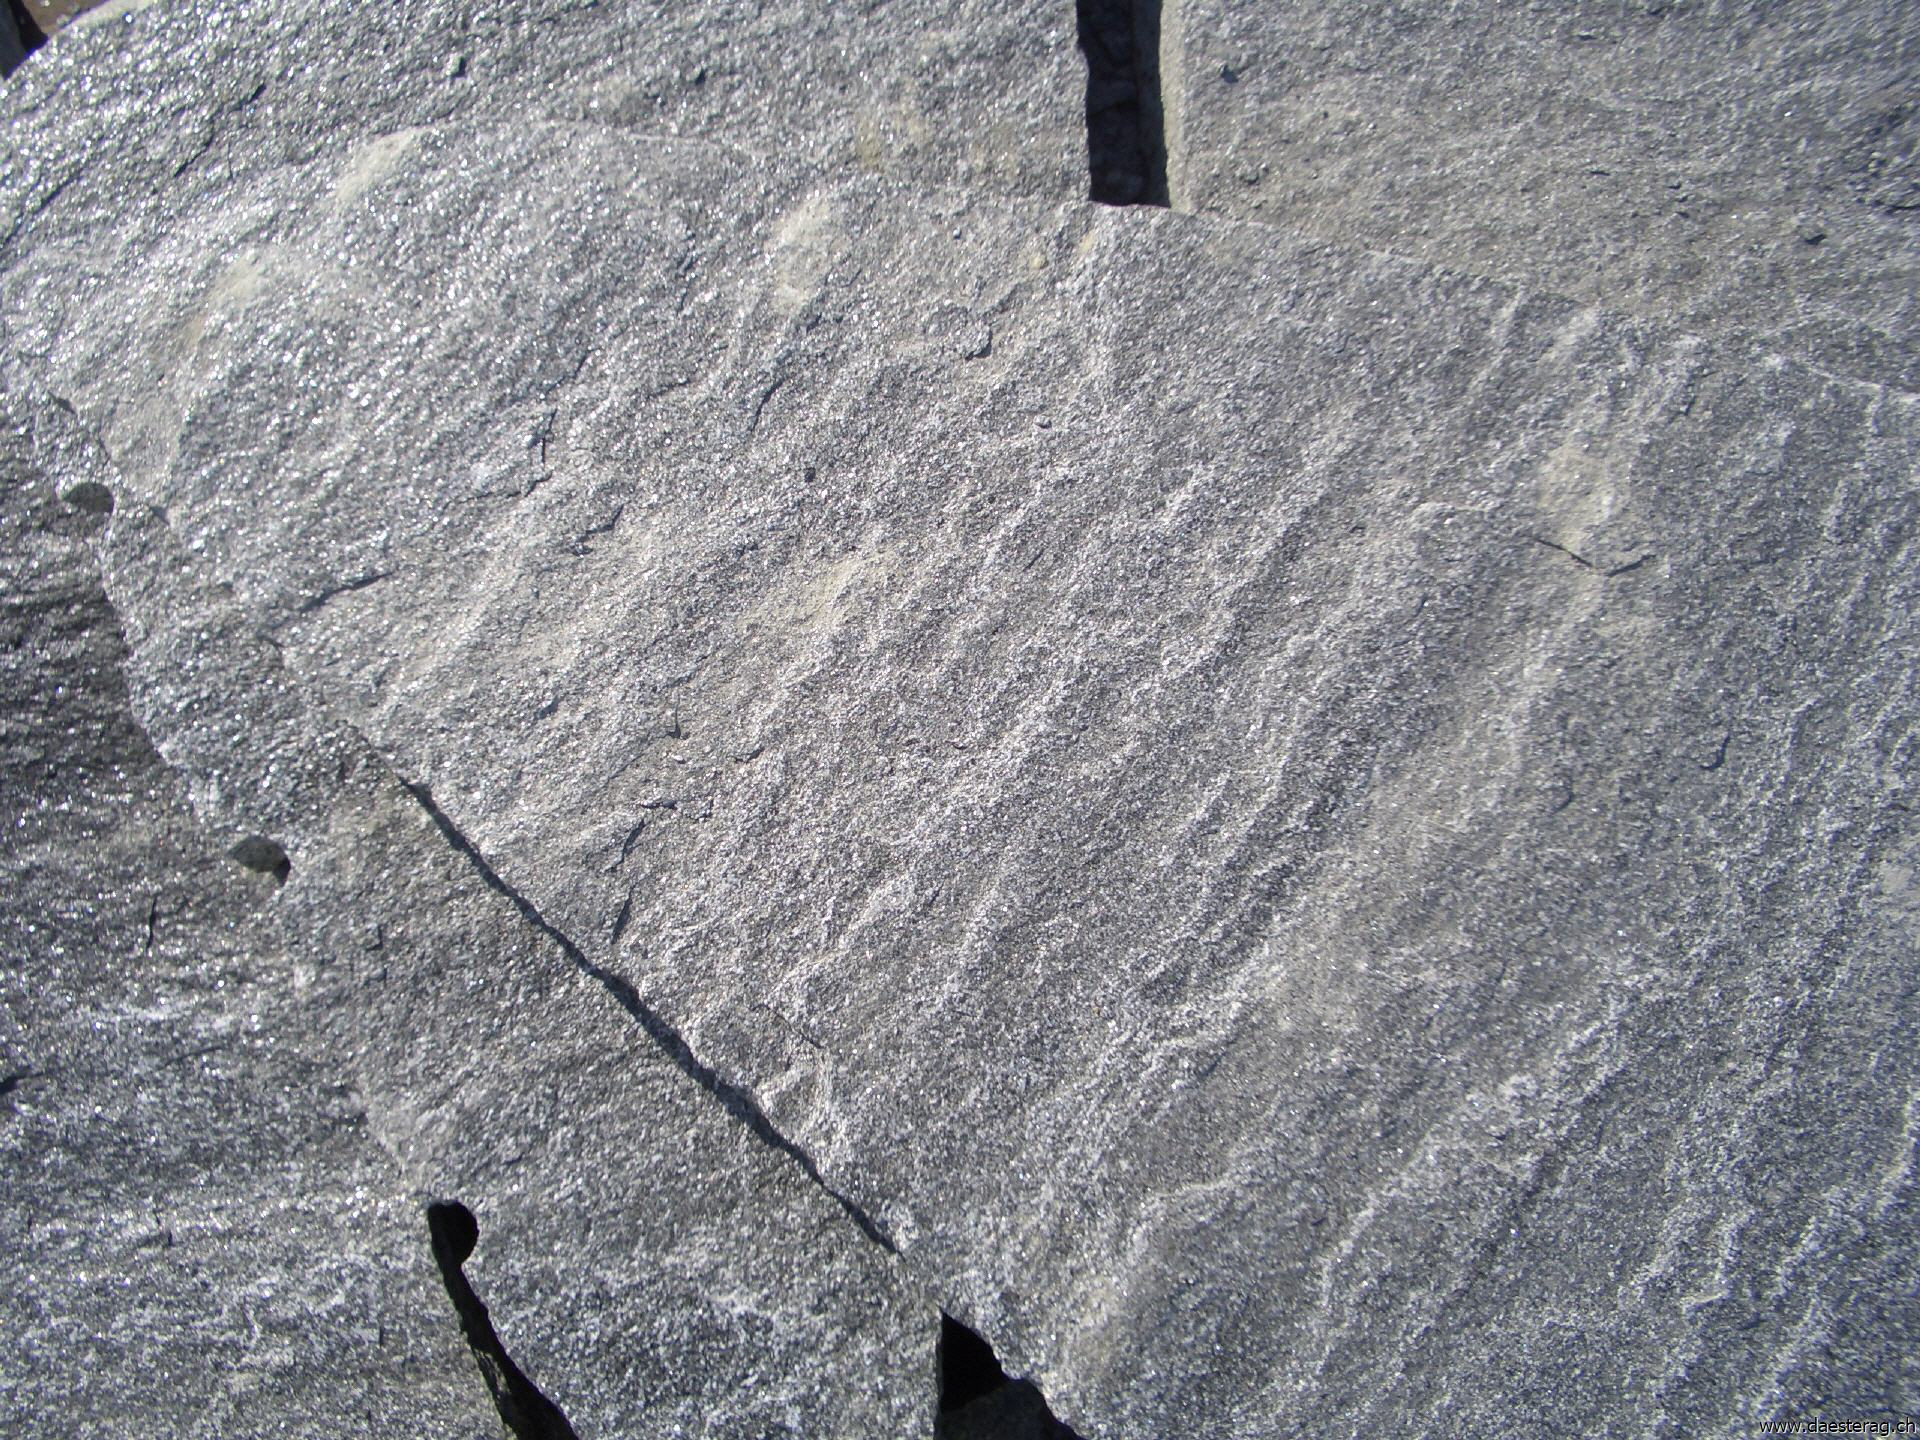 mosaikplatten - oberfläche gespalten